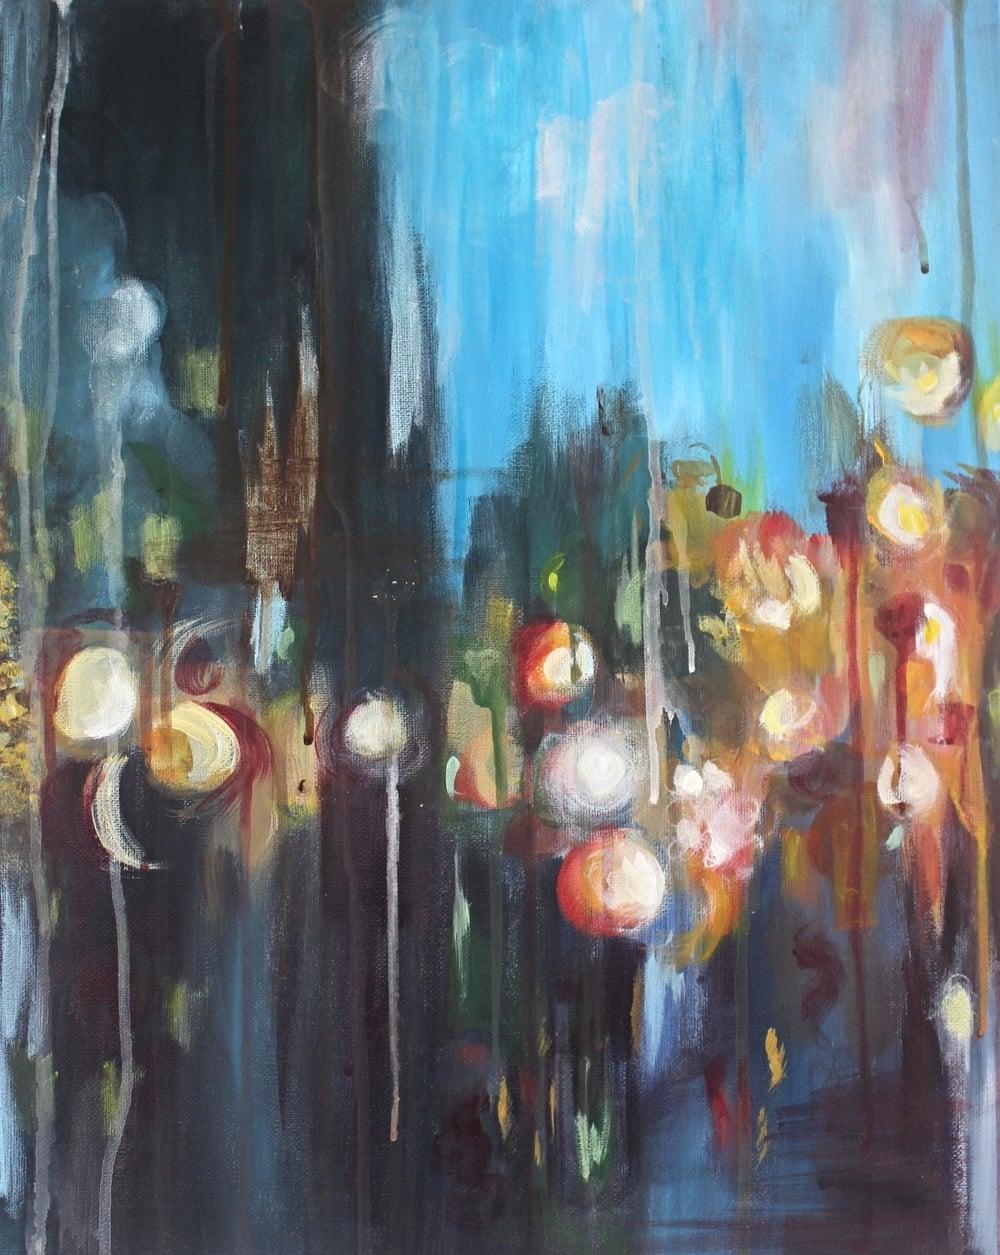 Gurleen Virk,  Untitled  (2015)